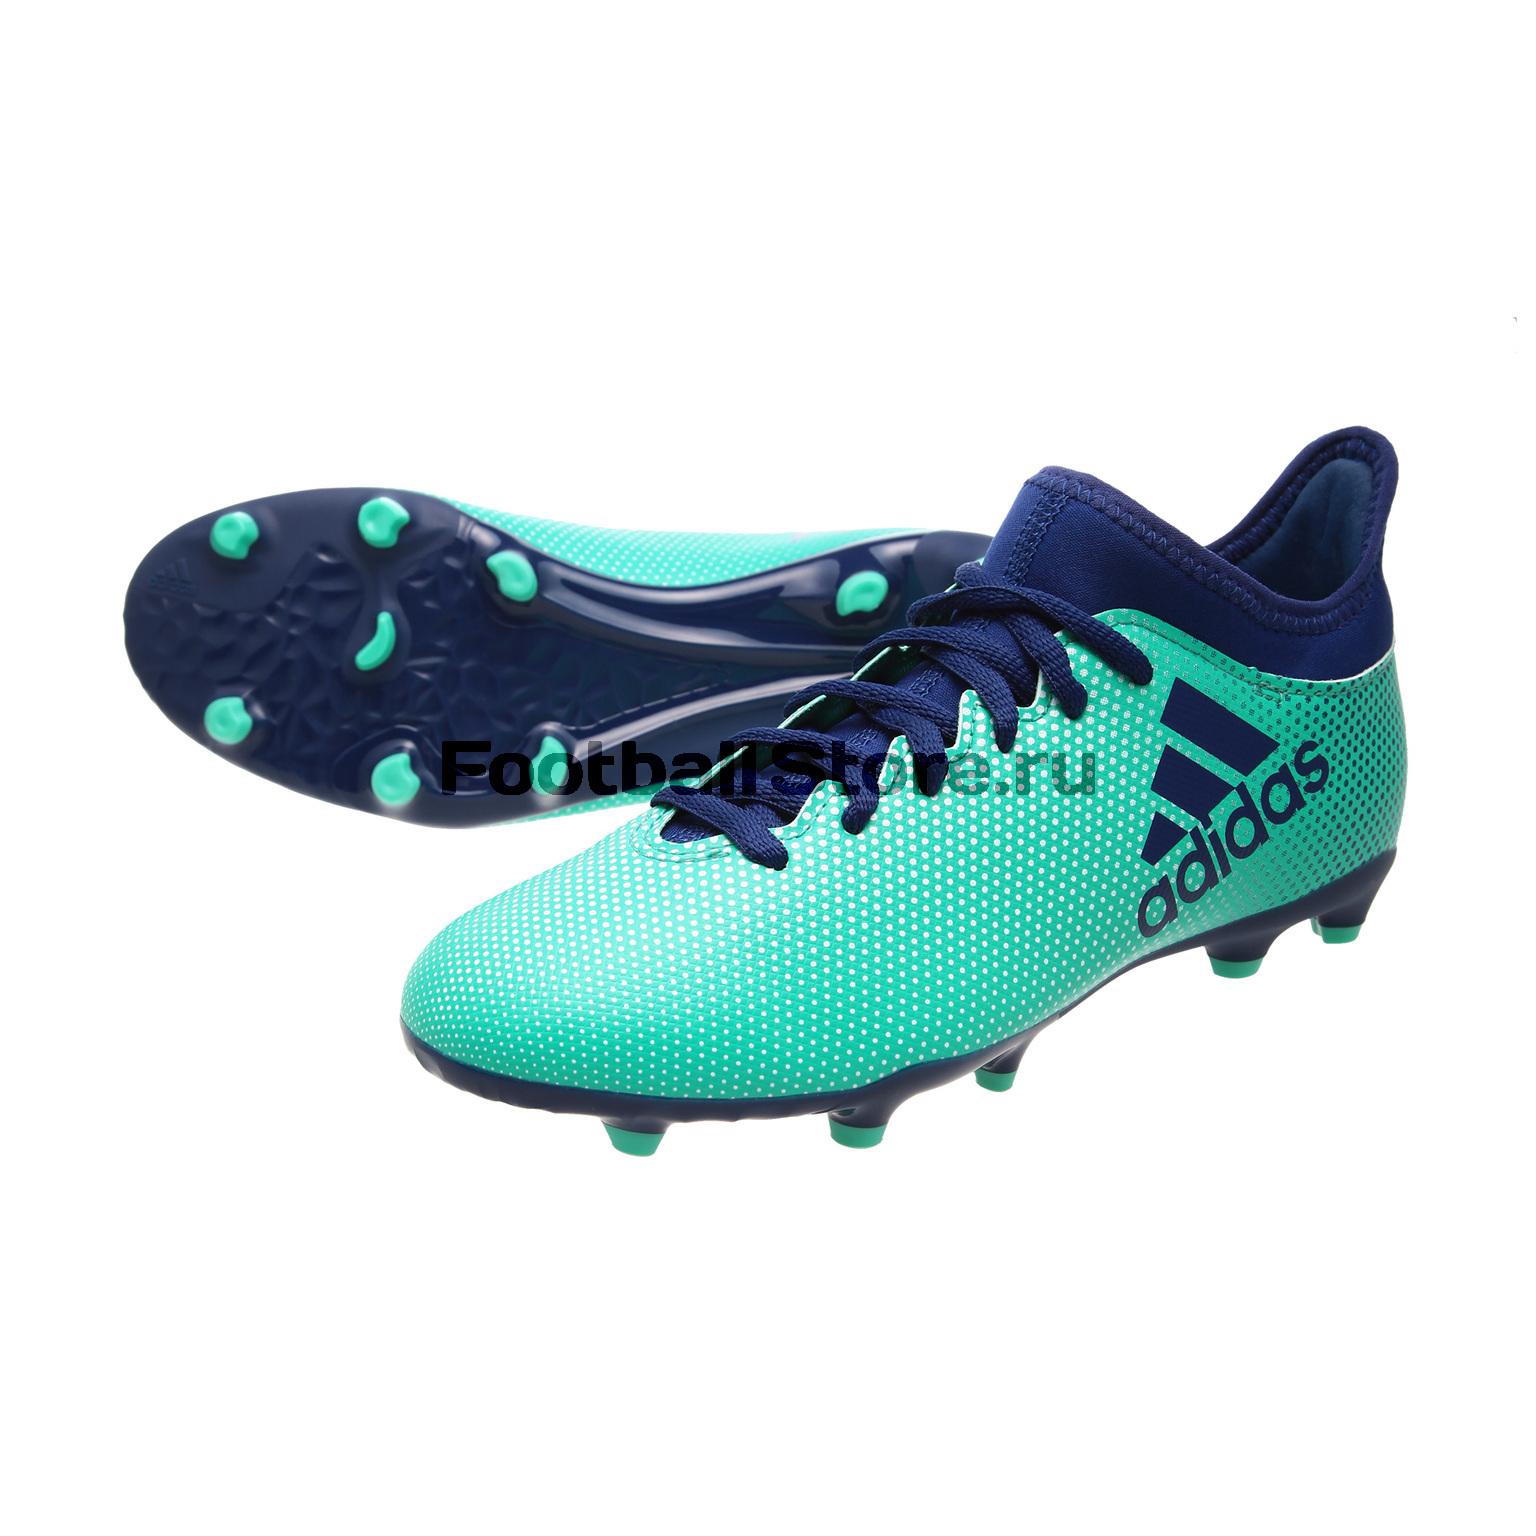 Бутсы Adidas X 17.3 FG JR CP8993 игровые бутсы adidas бутсы adidas x 16 purechaos fg bb5615